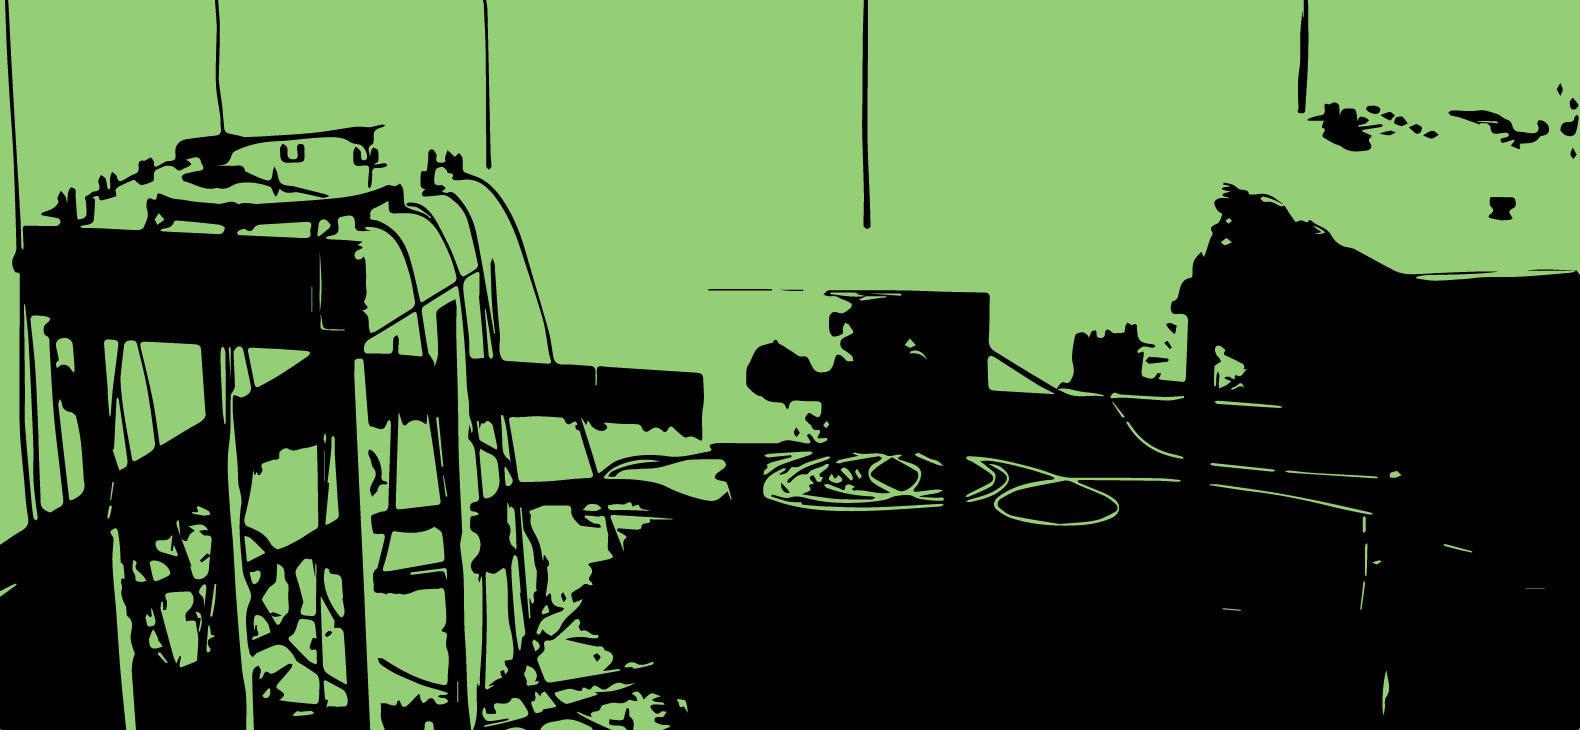 Steven Tevels: Solanum Tuberosum Sound Synthesis, Ausstellung im Schafhof, 2017